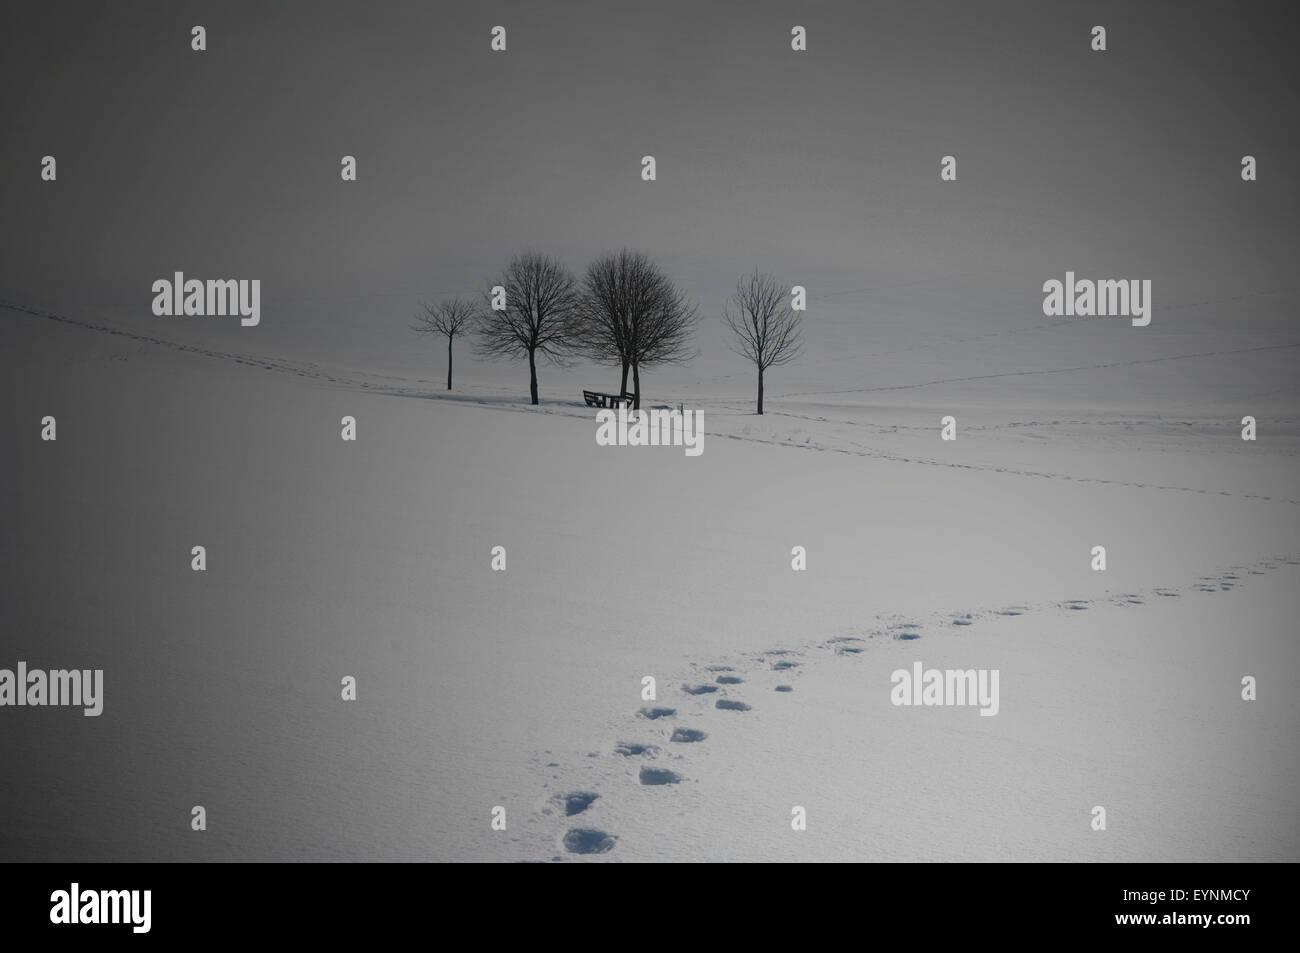 Winterimpression, Baeume, Beleuchtungseffekt - Stock Image